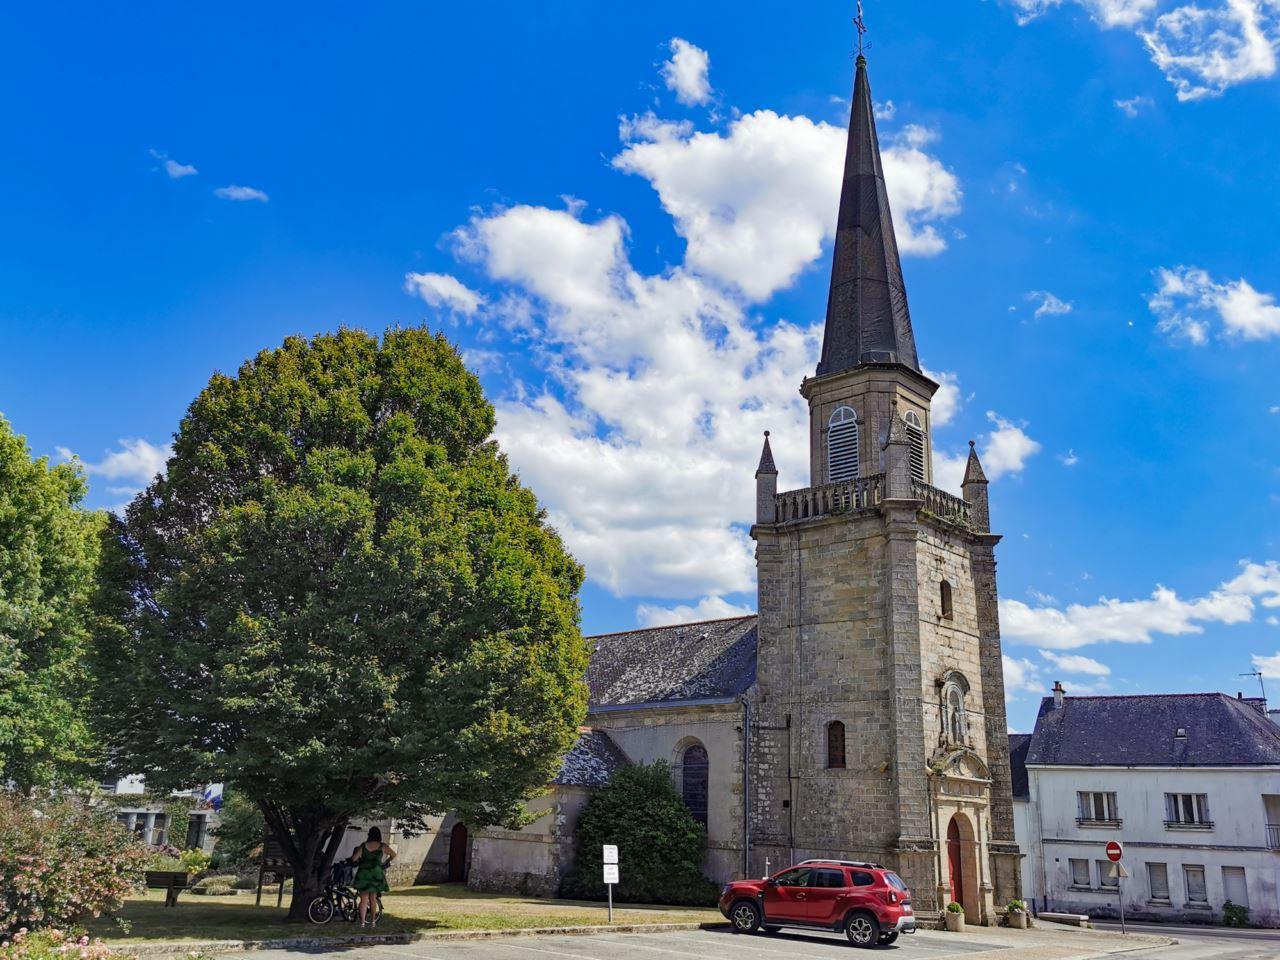 Eglise de Sainte-Hélène